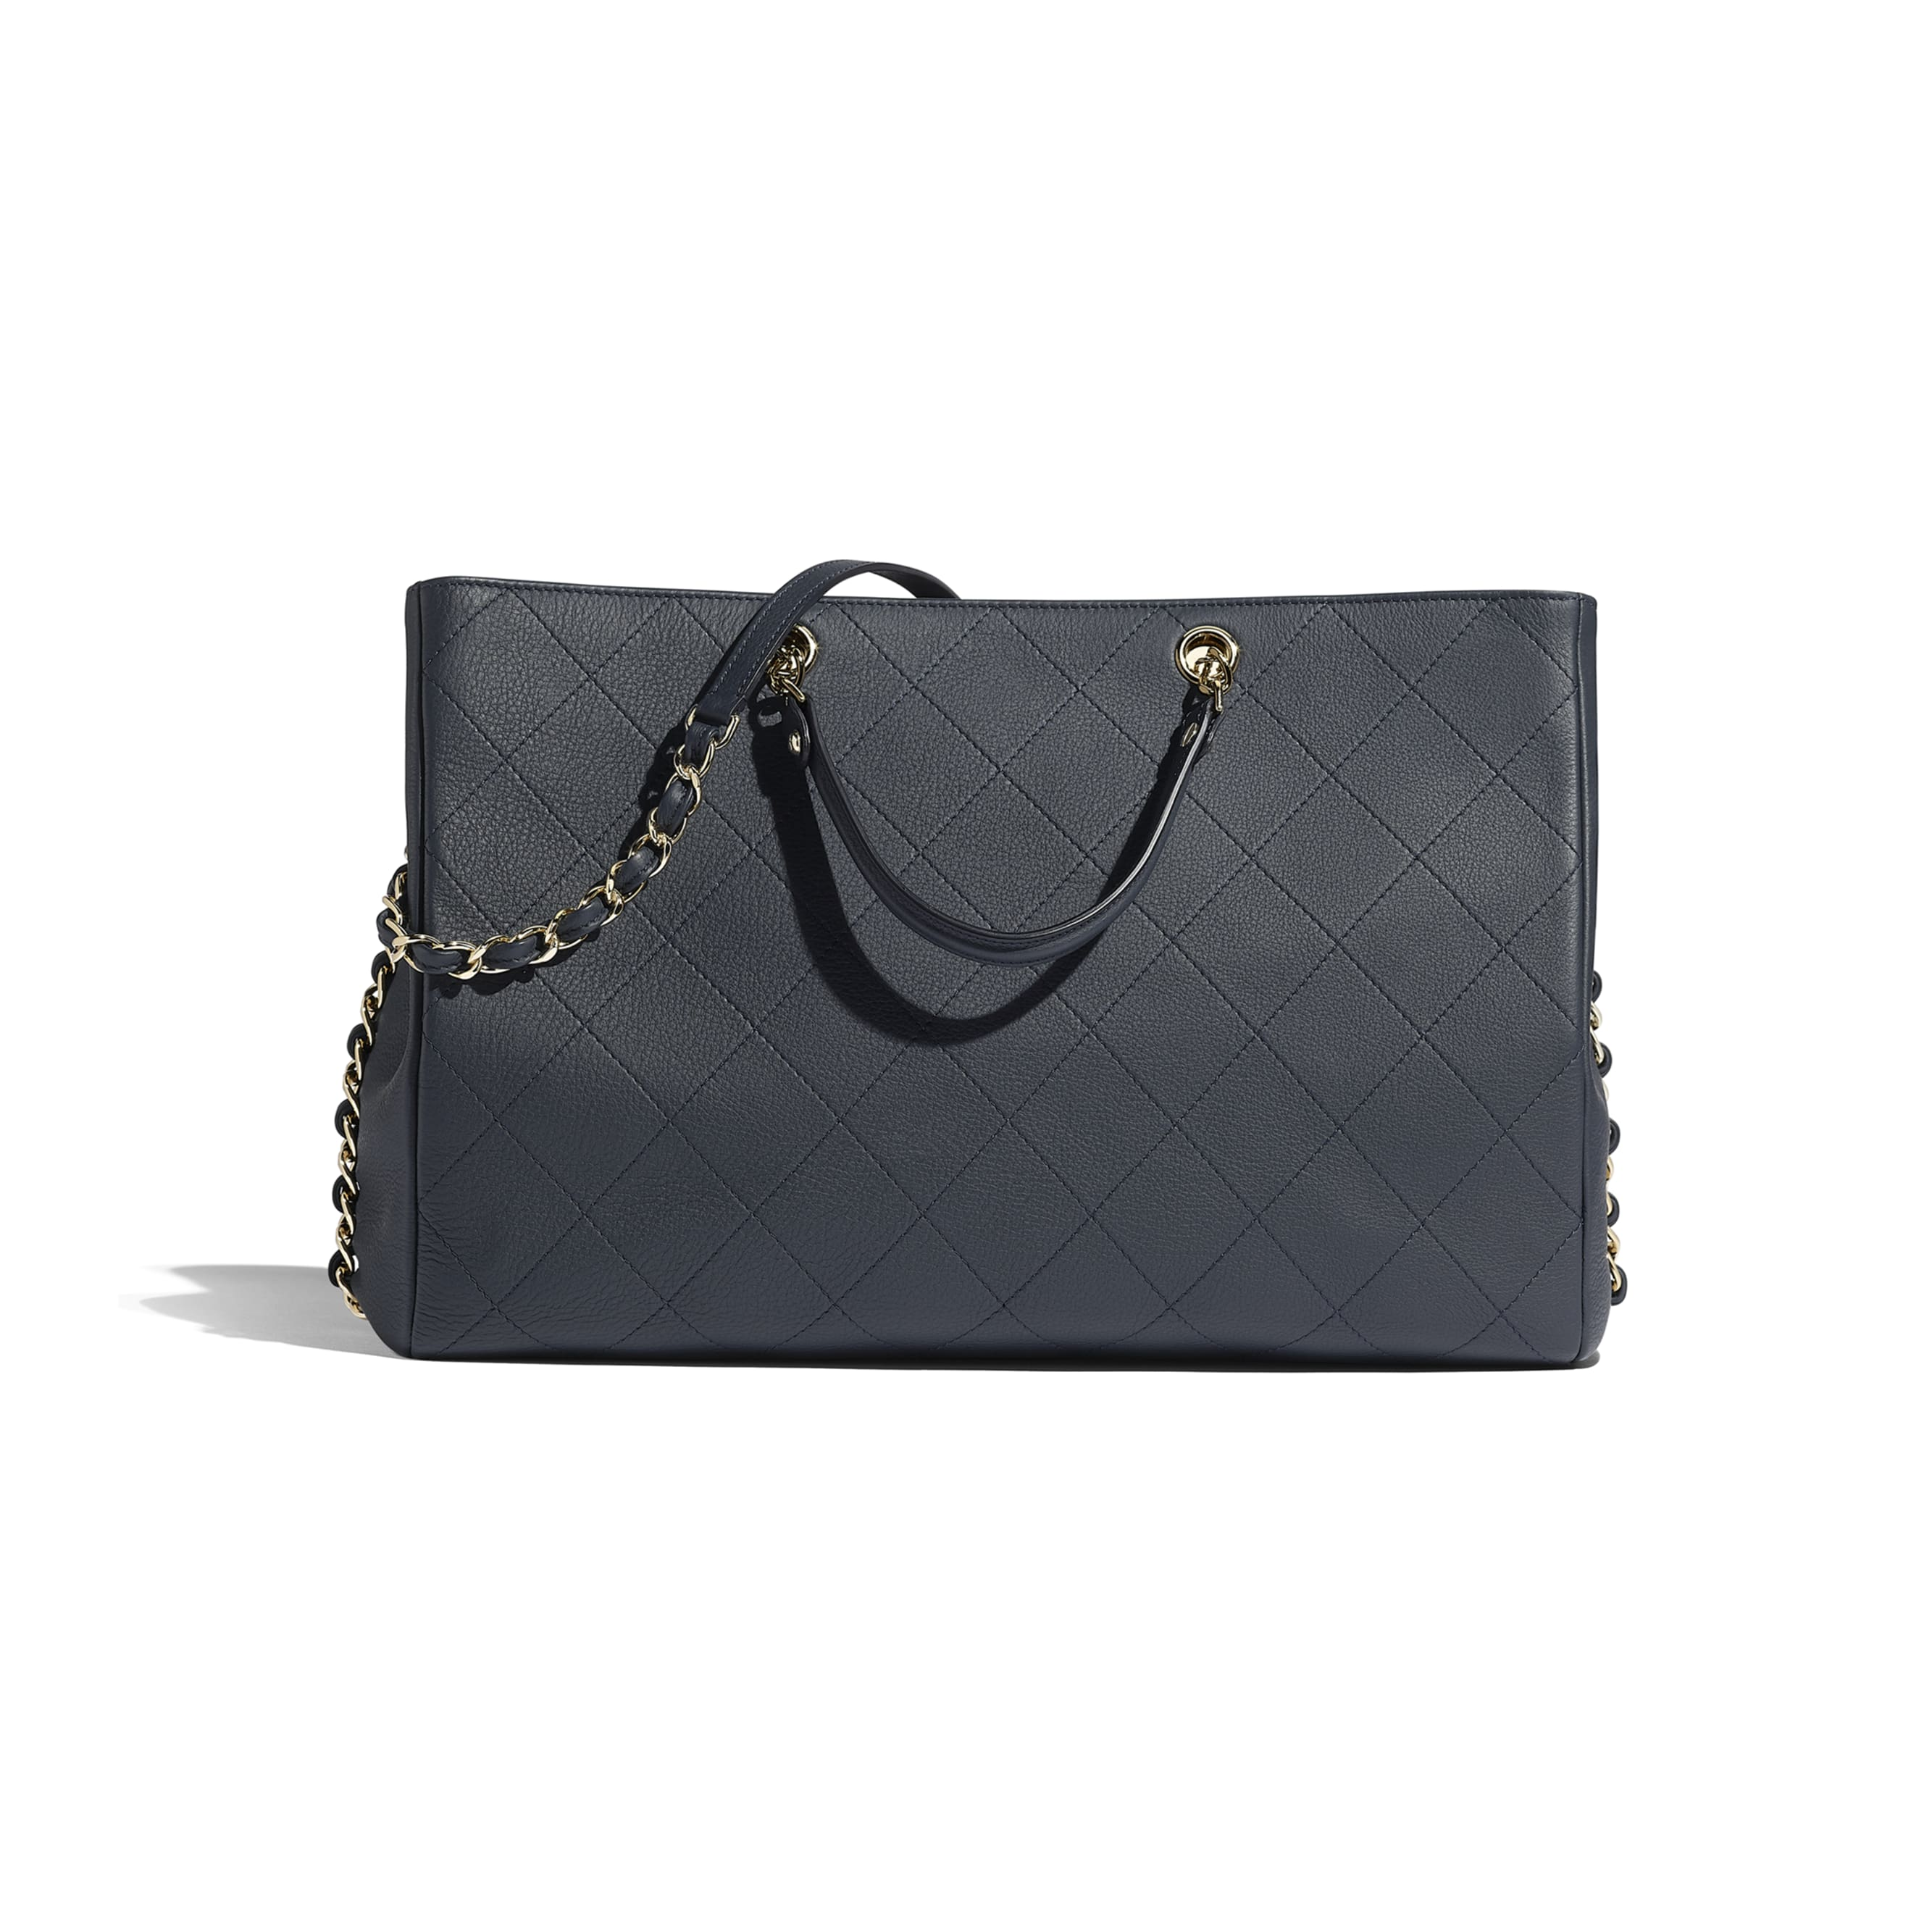 8de108a98ca6 ... Large Shopping Bag - Navy Blue - Bullskin   Gold-Tone Metal -  Alternative view